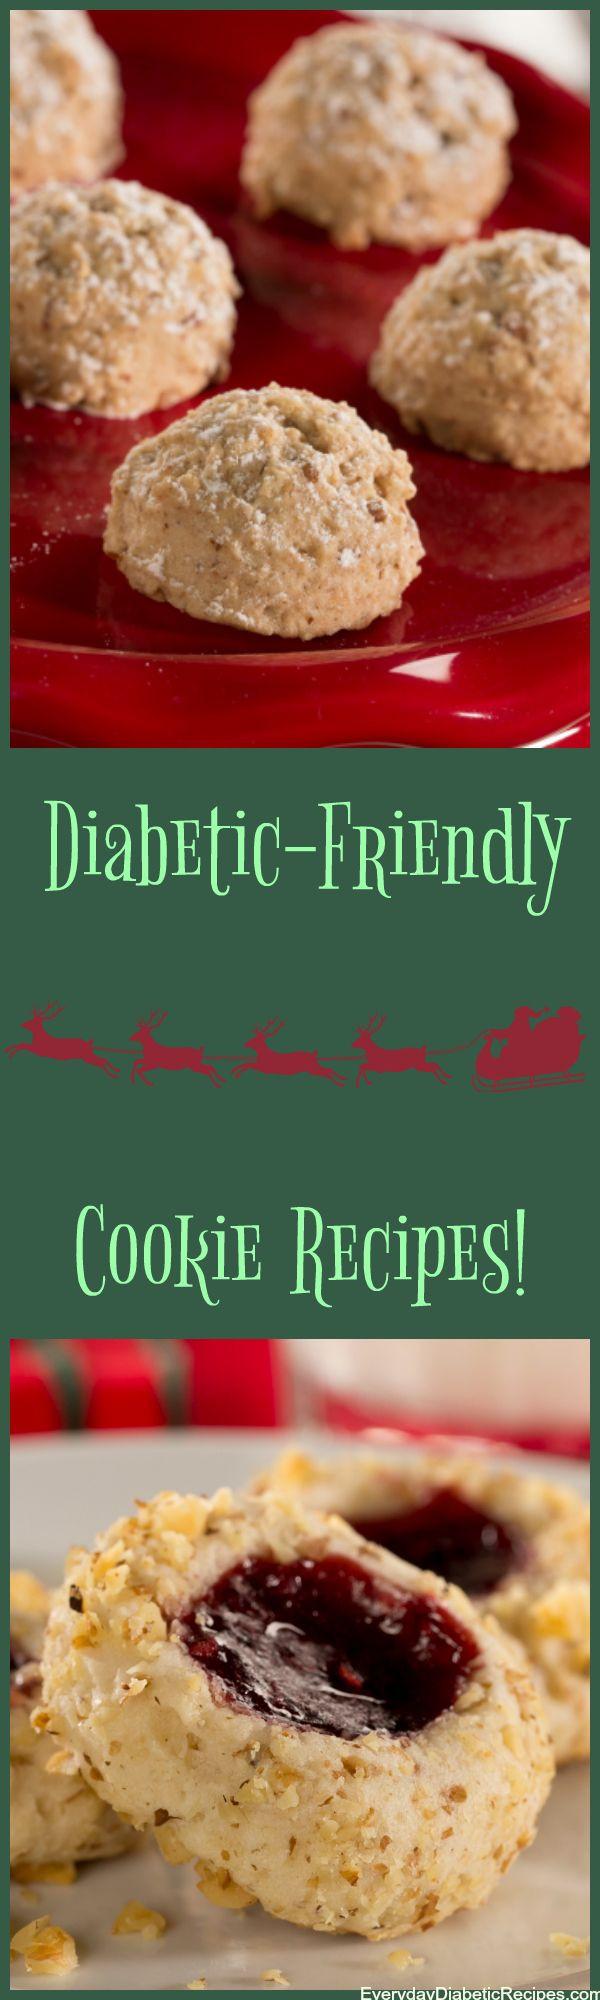 Diabetic Christmas Cookies Recipes  Best 25 Diabetic cookie recipes ideas on Pinterest